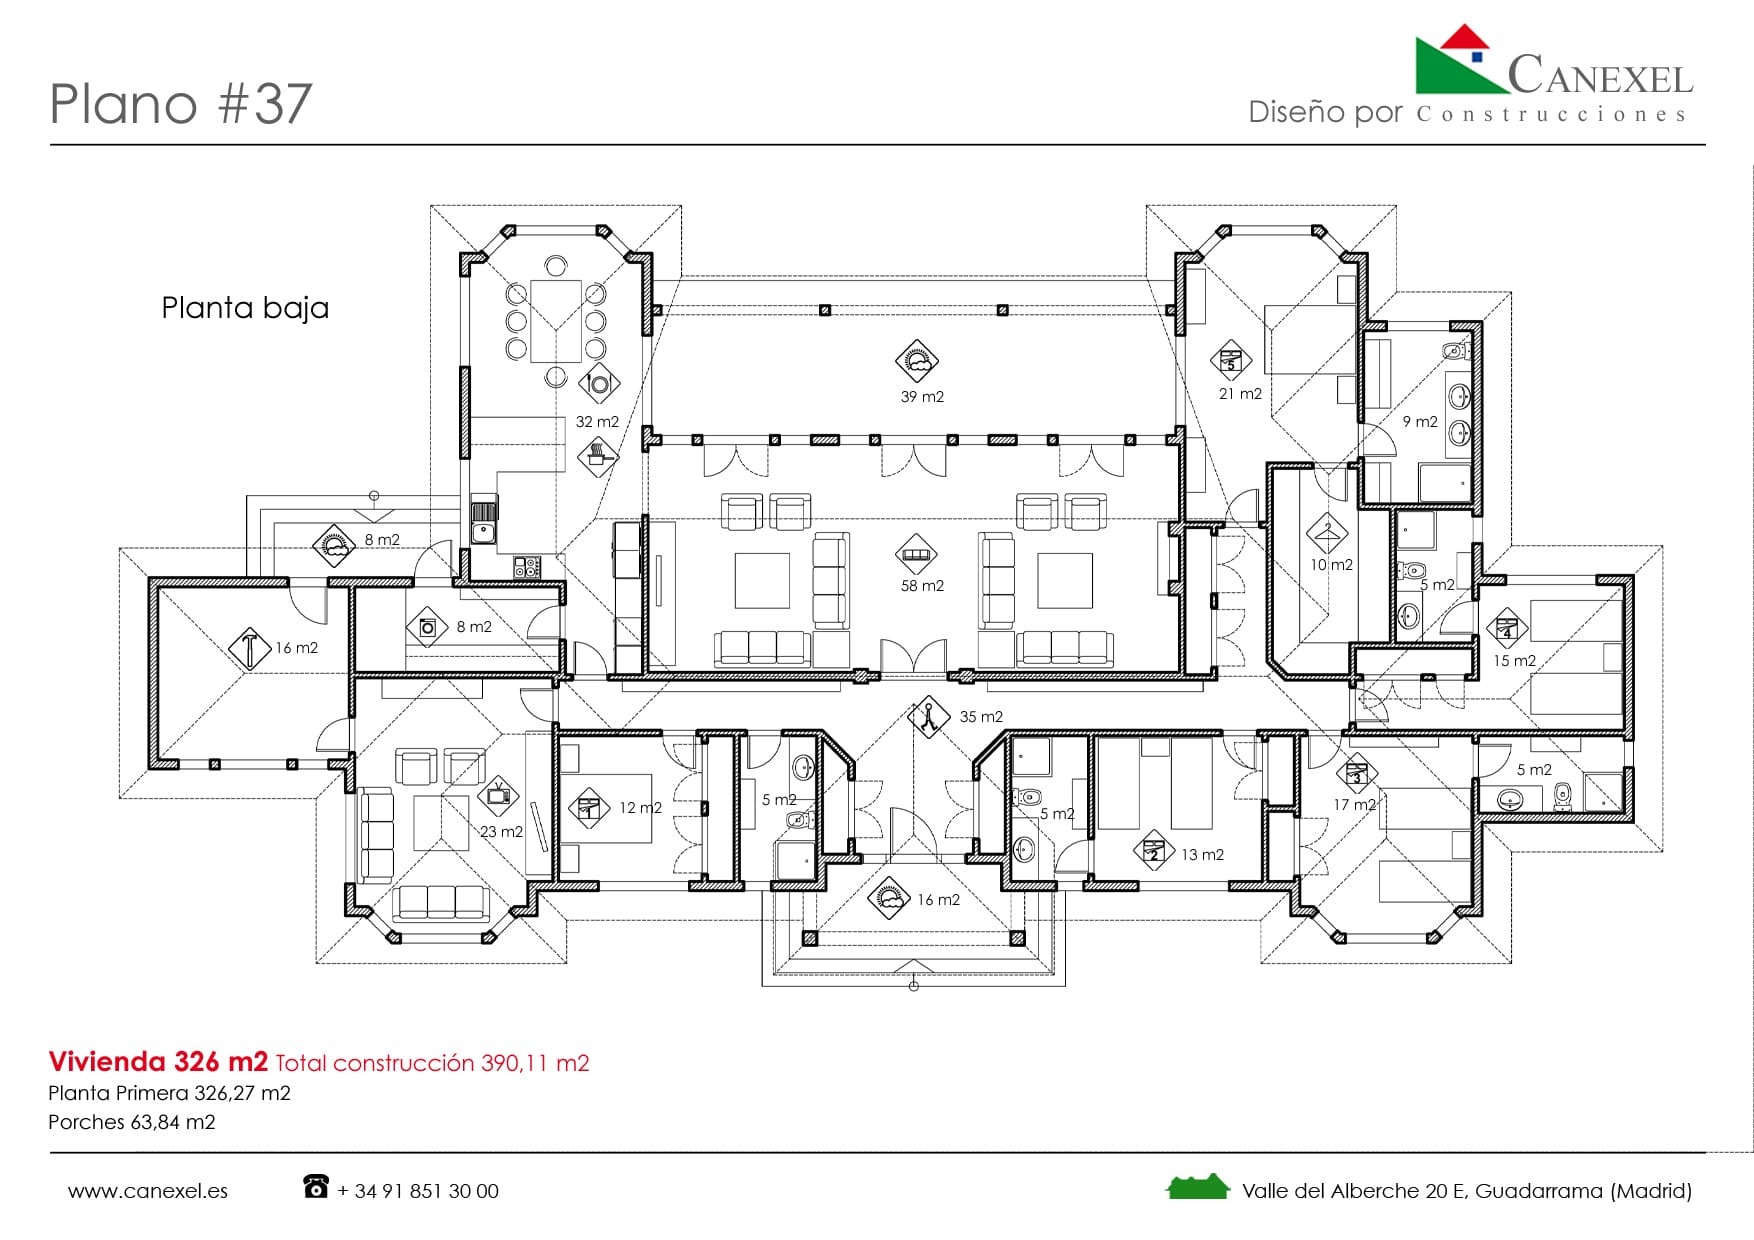 Planos de casas de una planta canexel for Planos casas modernas 1 planta